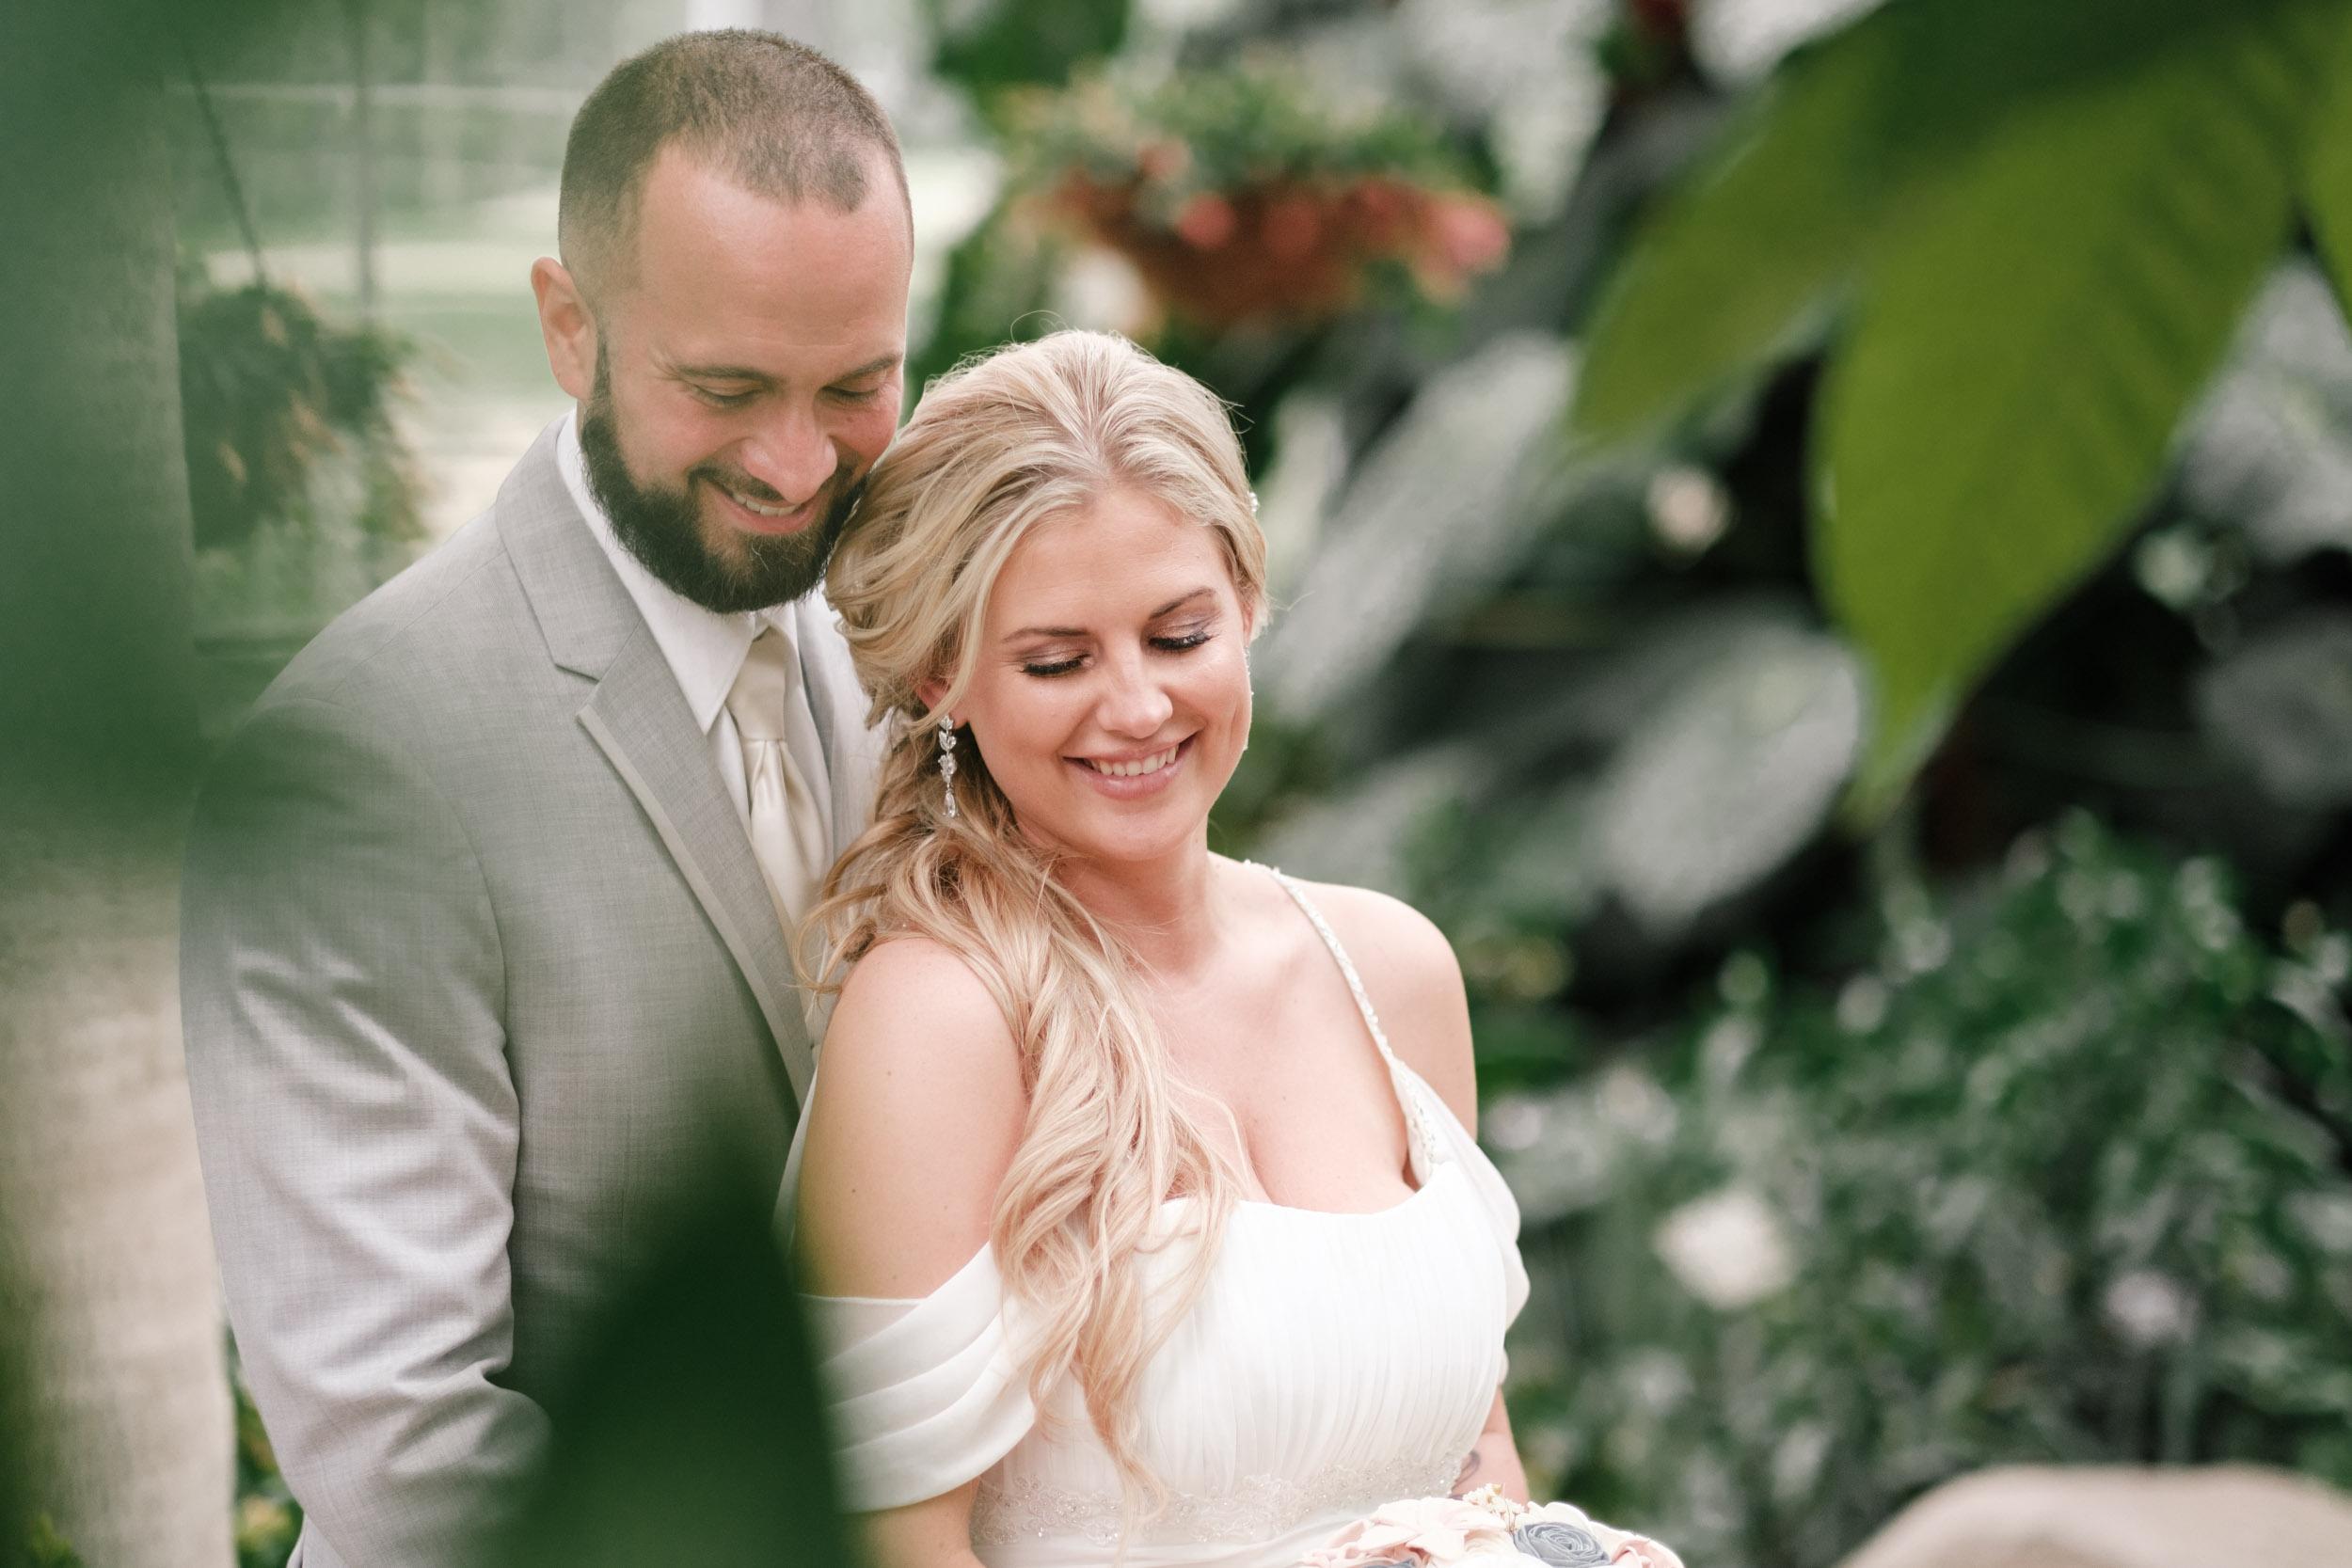 19-06-01 Megan Josh - Nicholas Conservatory Wedding-39.jpg